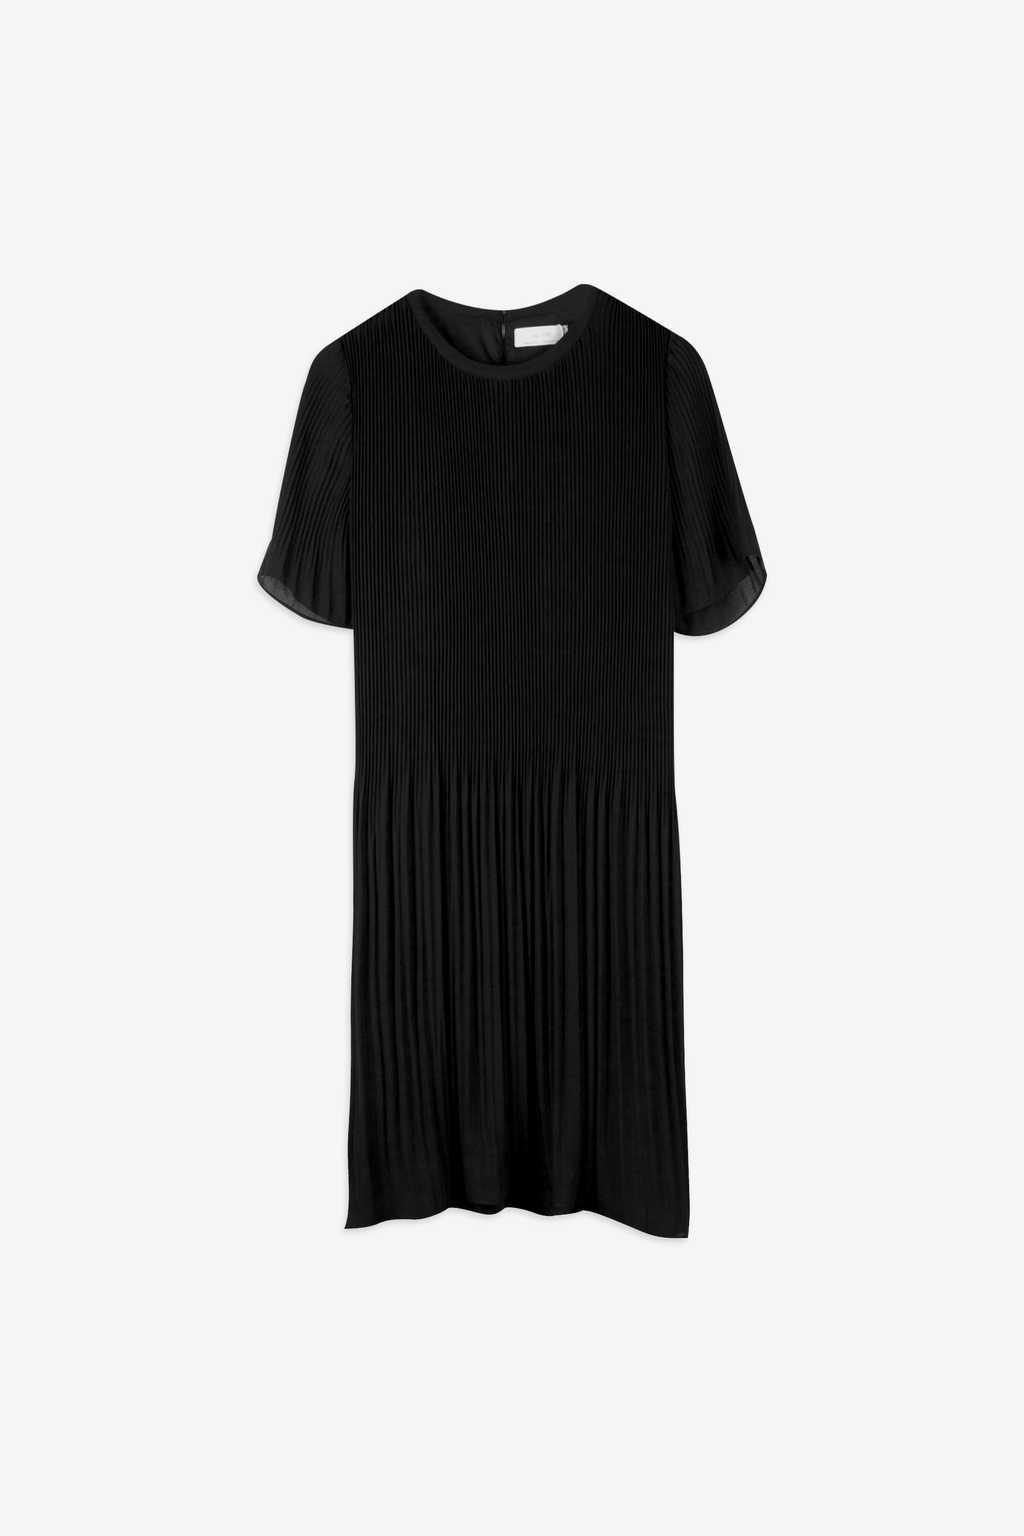 Dress 1304 Black 7